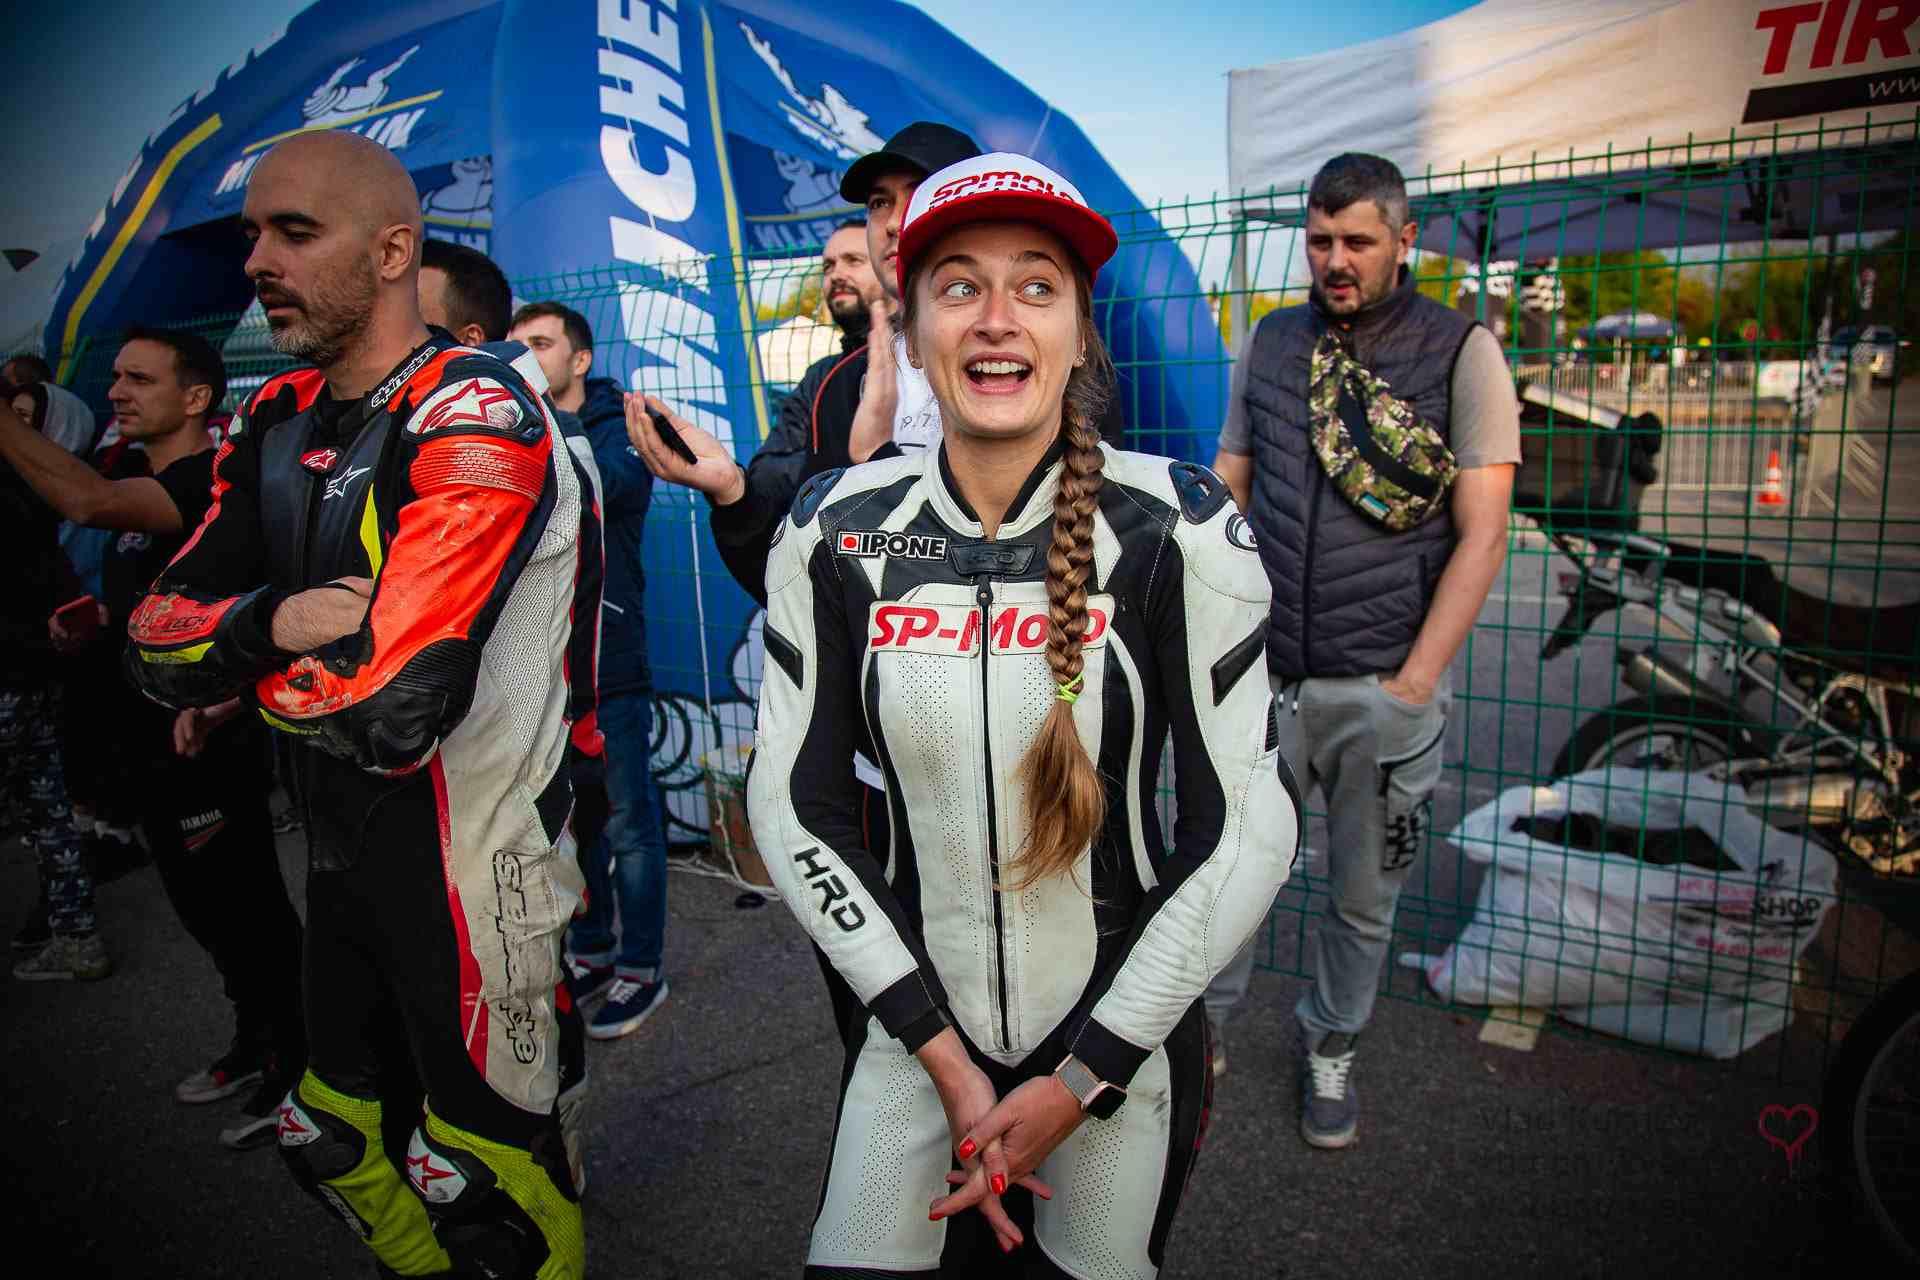 5-6_etap_MotoGPUkraine_061